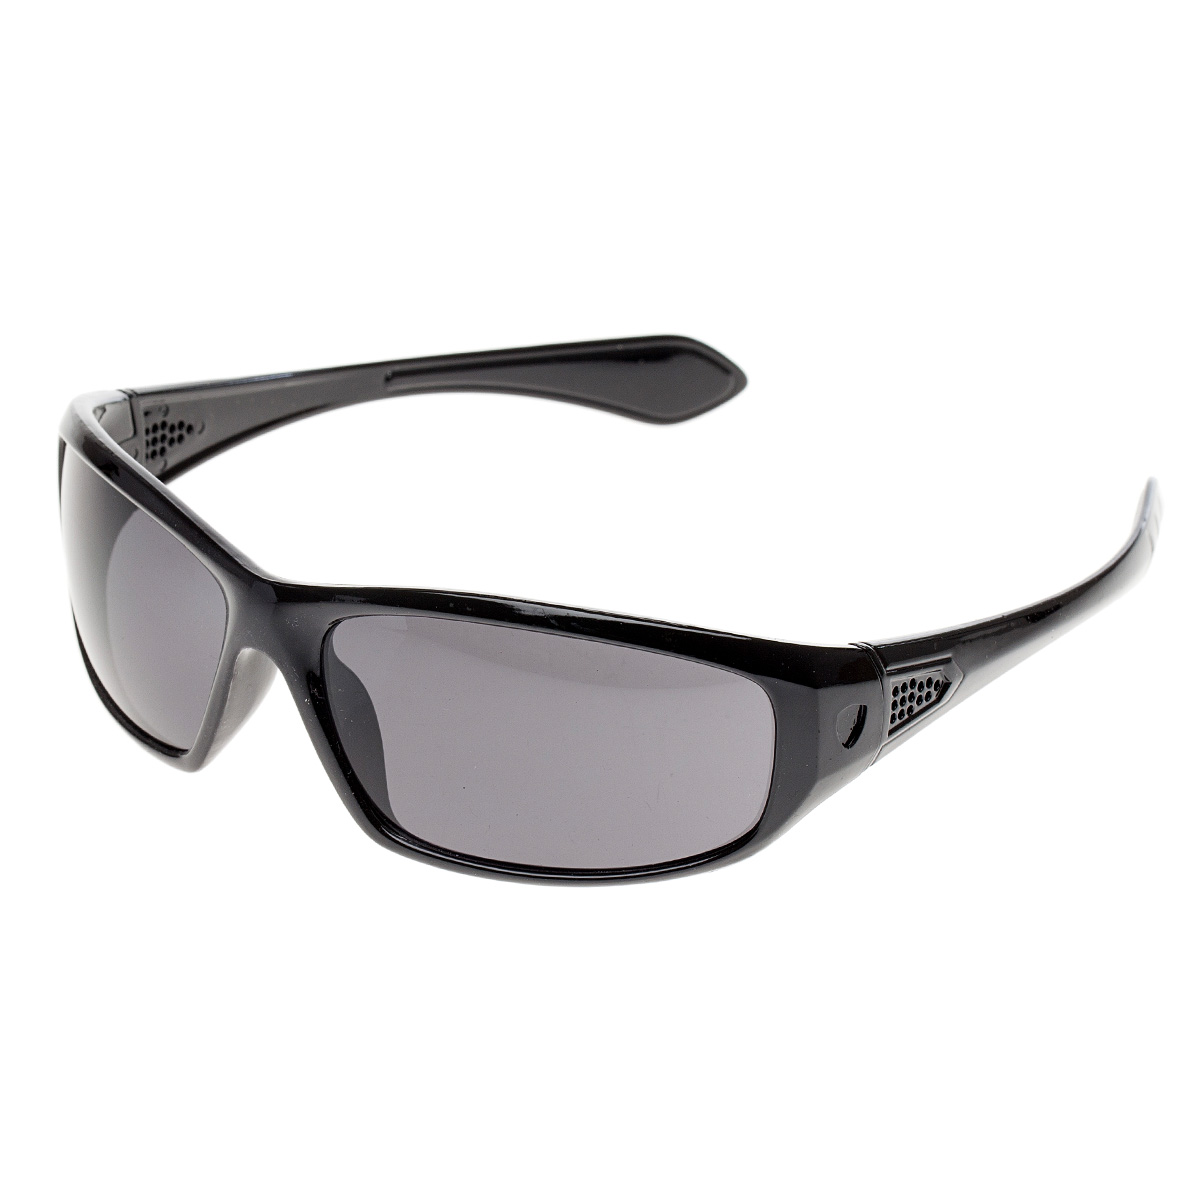 Очки солнцезащитные Overcome, 23032-50